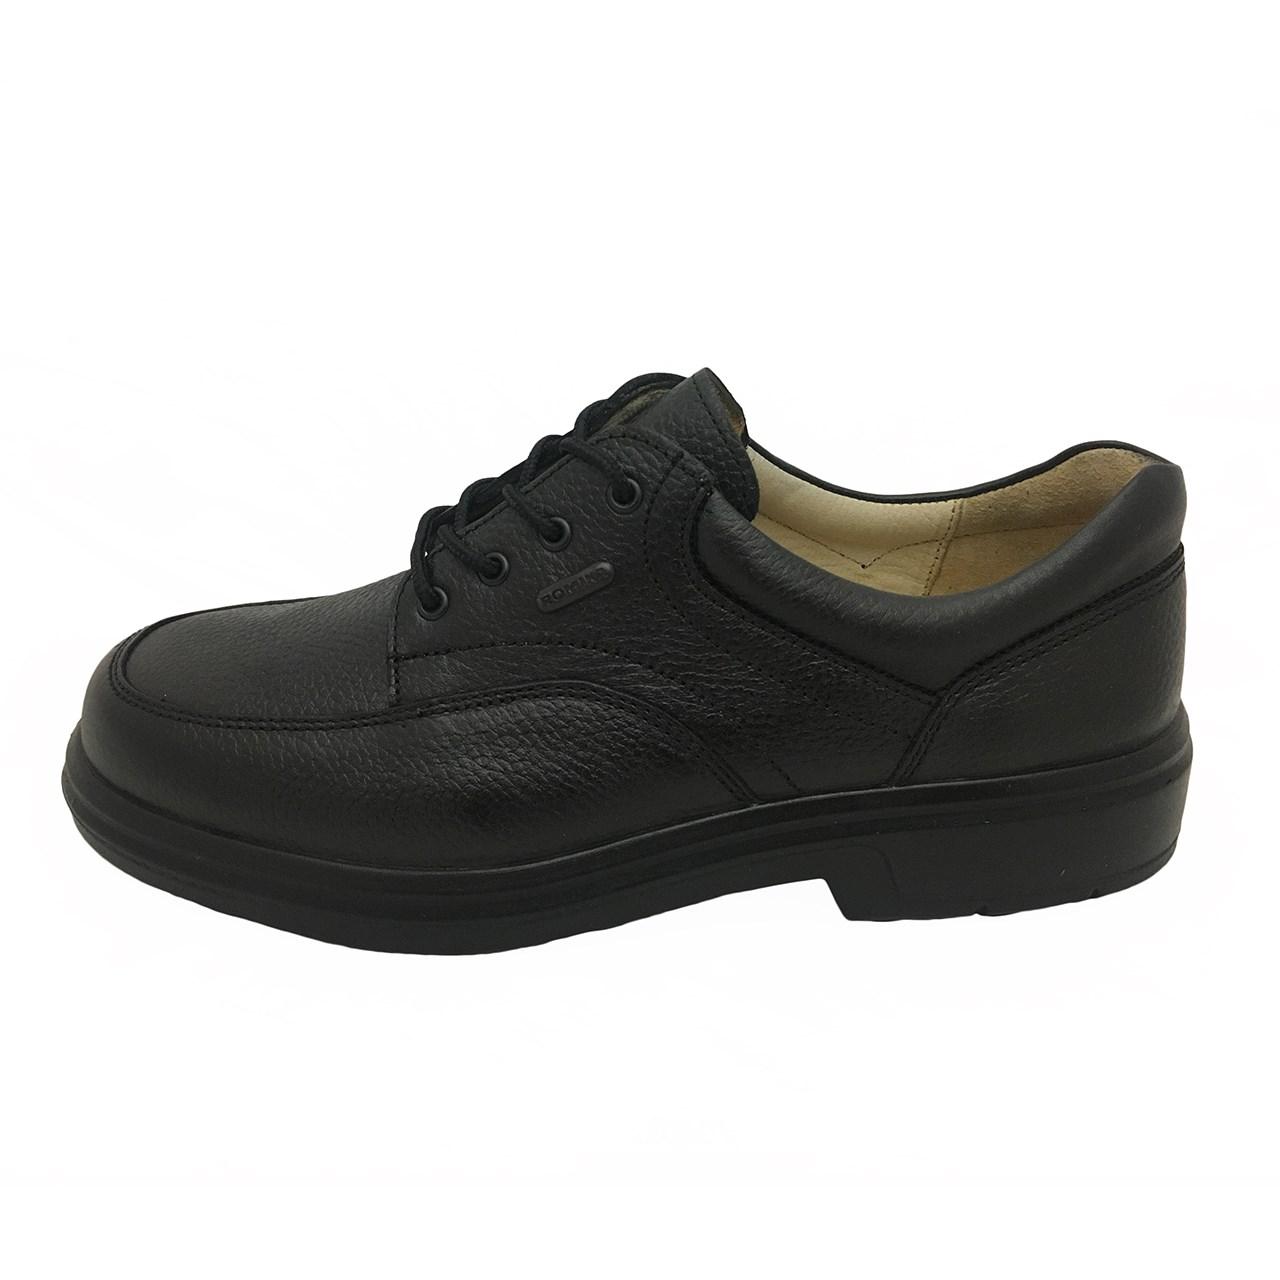 کفش چرم مردانه البرز  مدل آریزونا 1402